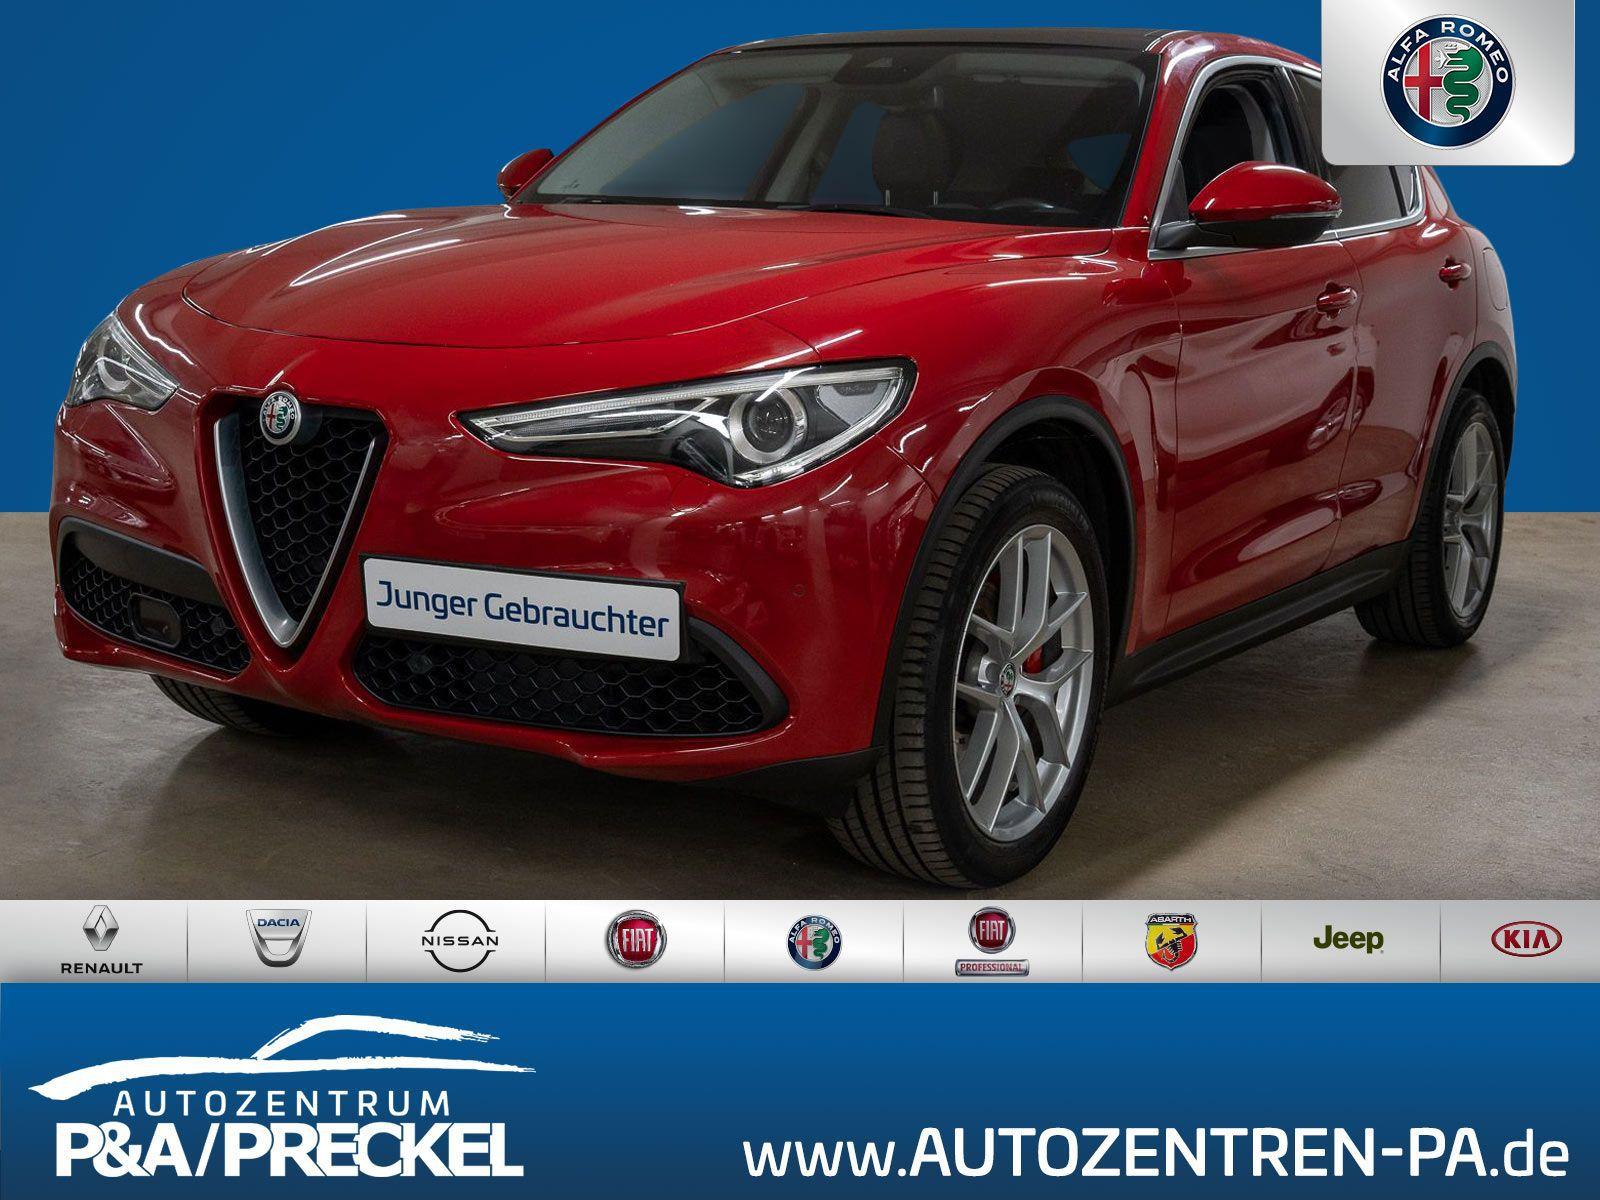 Alfa Romeo Stelvio First Edition 2.0 Turbo / Navi/Glasdach, Jahr 2017, Benzin